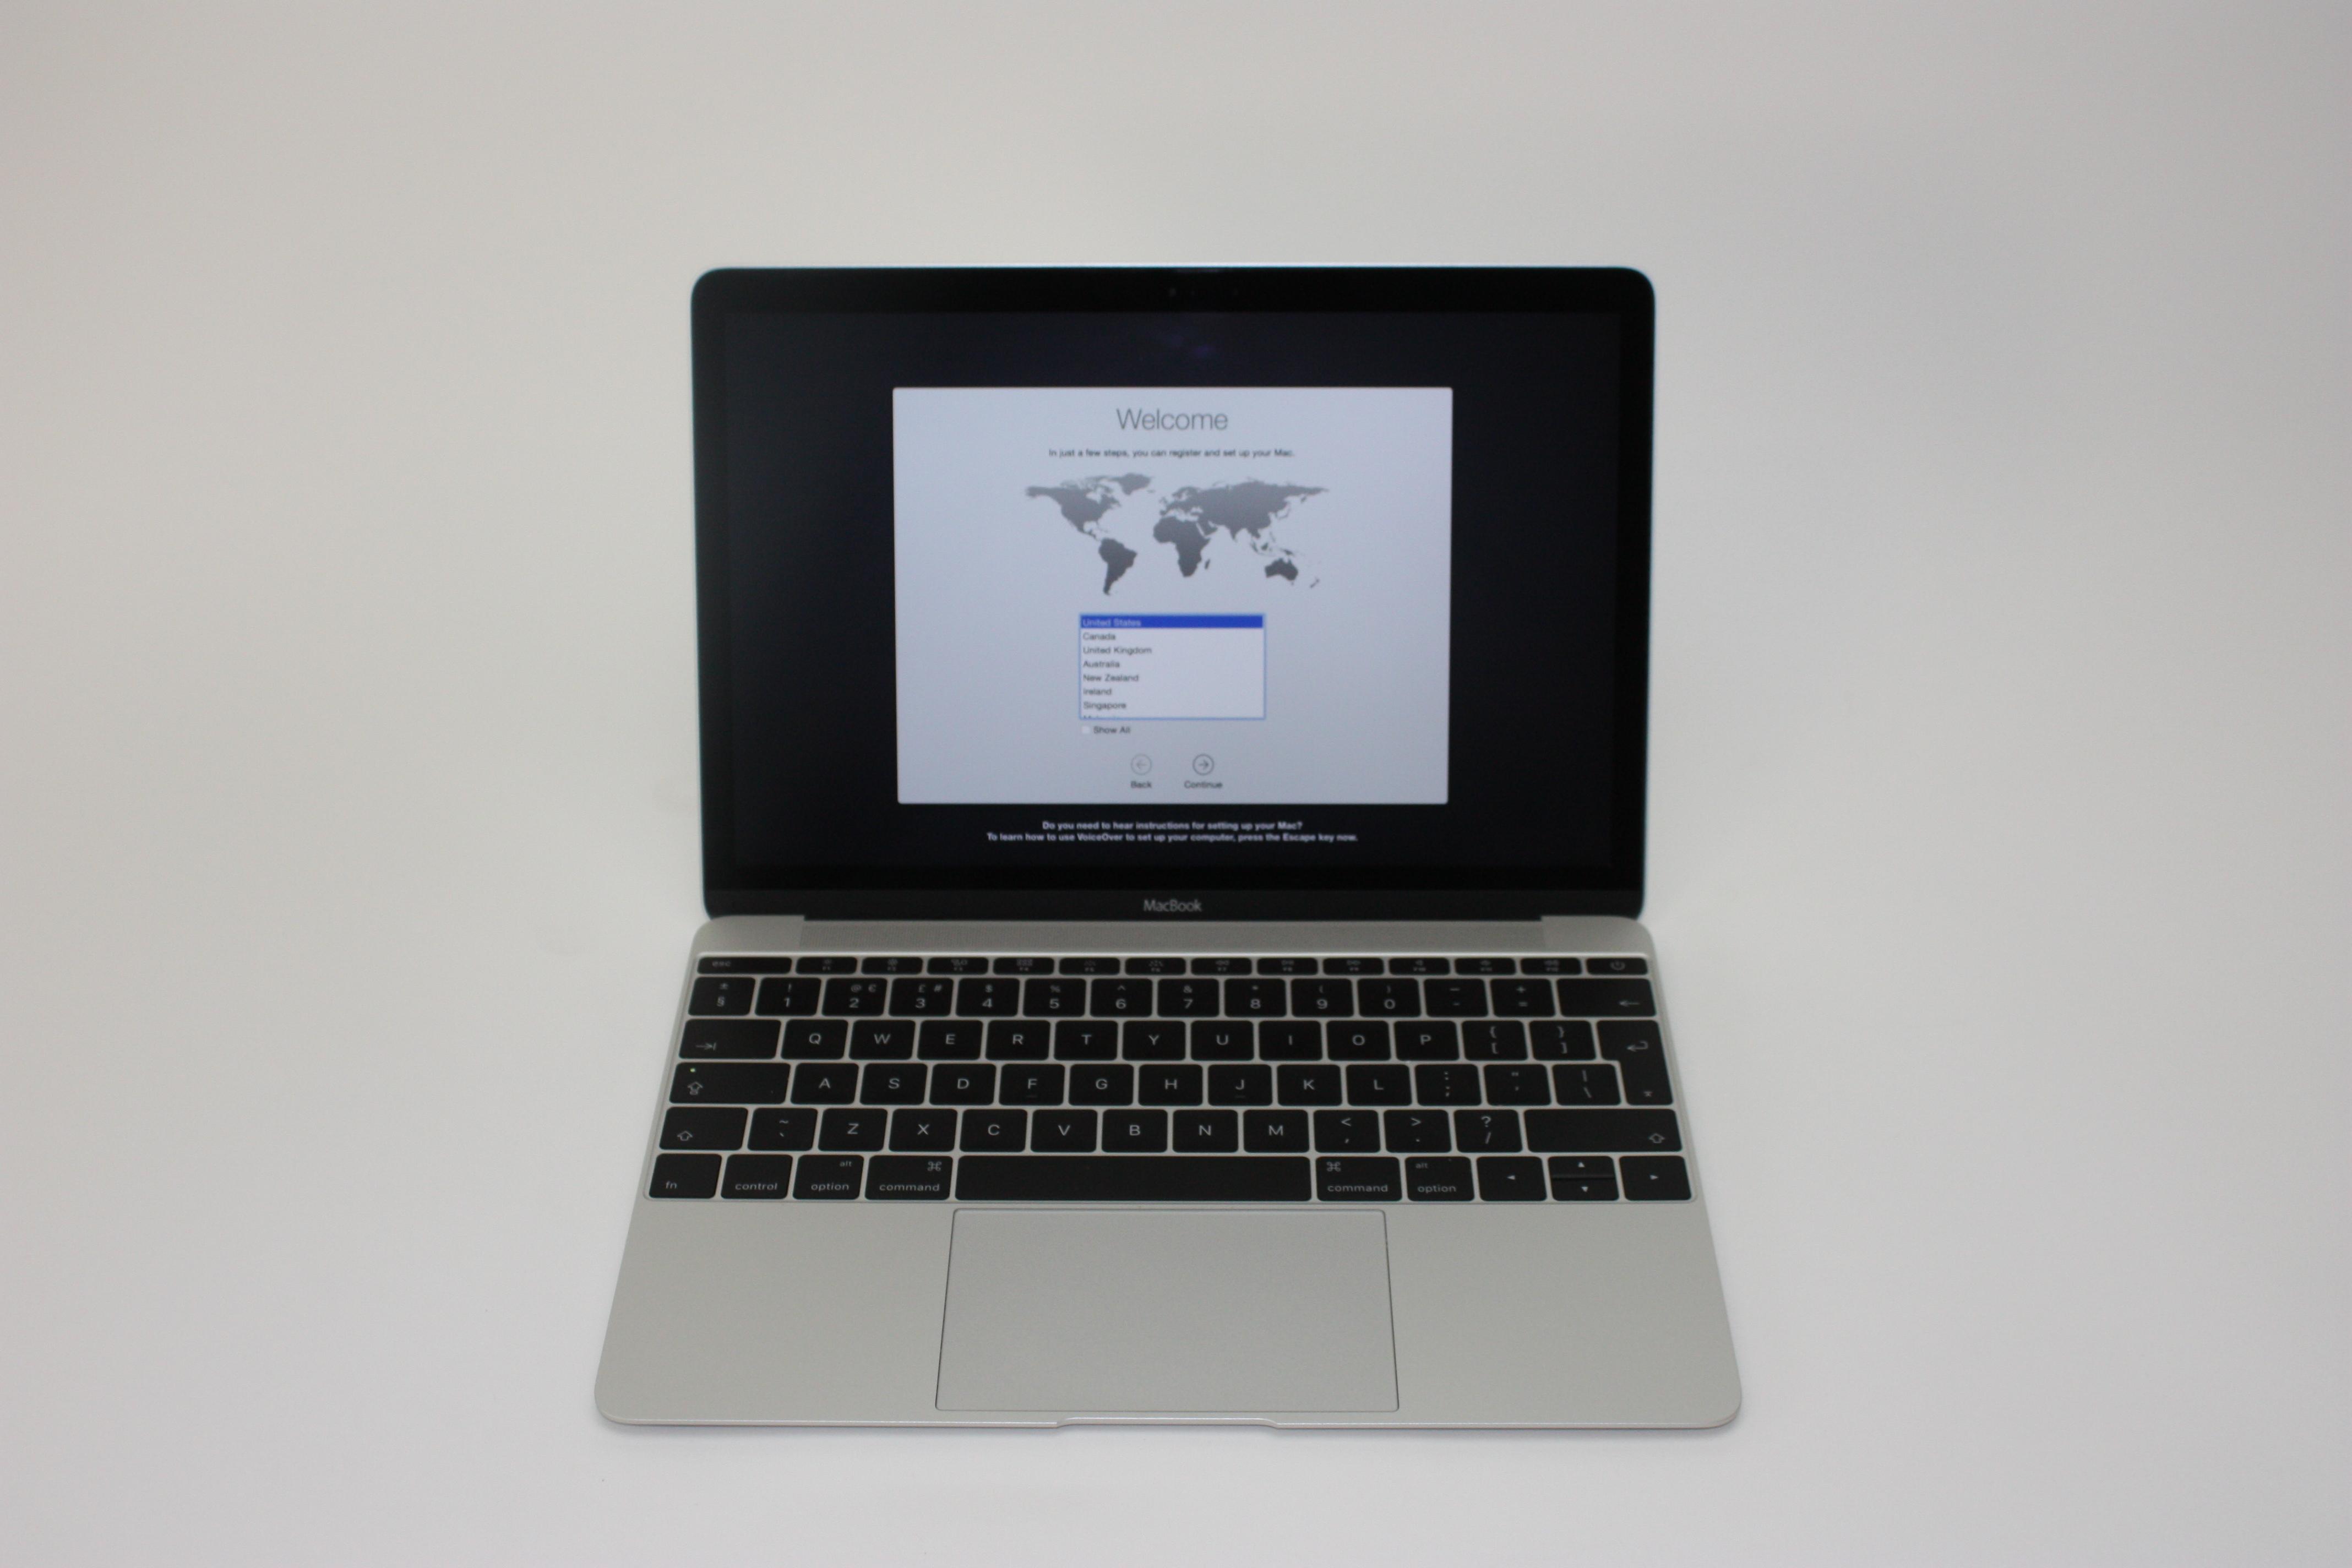 MacBook 12-inch Retina, 1.2 GHz Intel Core M, 8 GB 1600 MHz DDR3, 500 GB Flash Storage, image 1